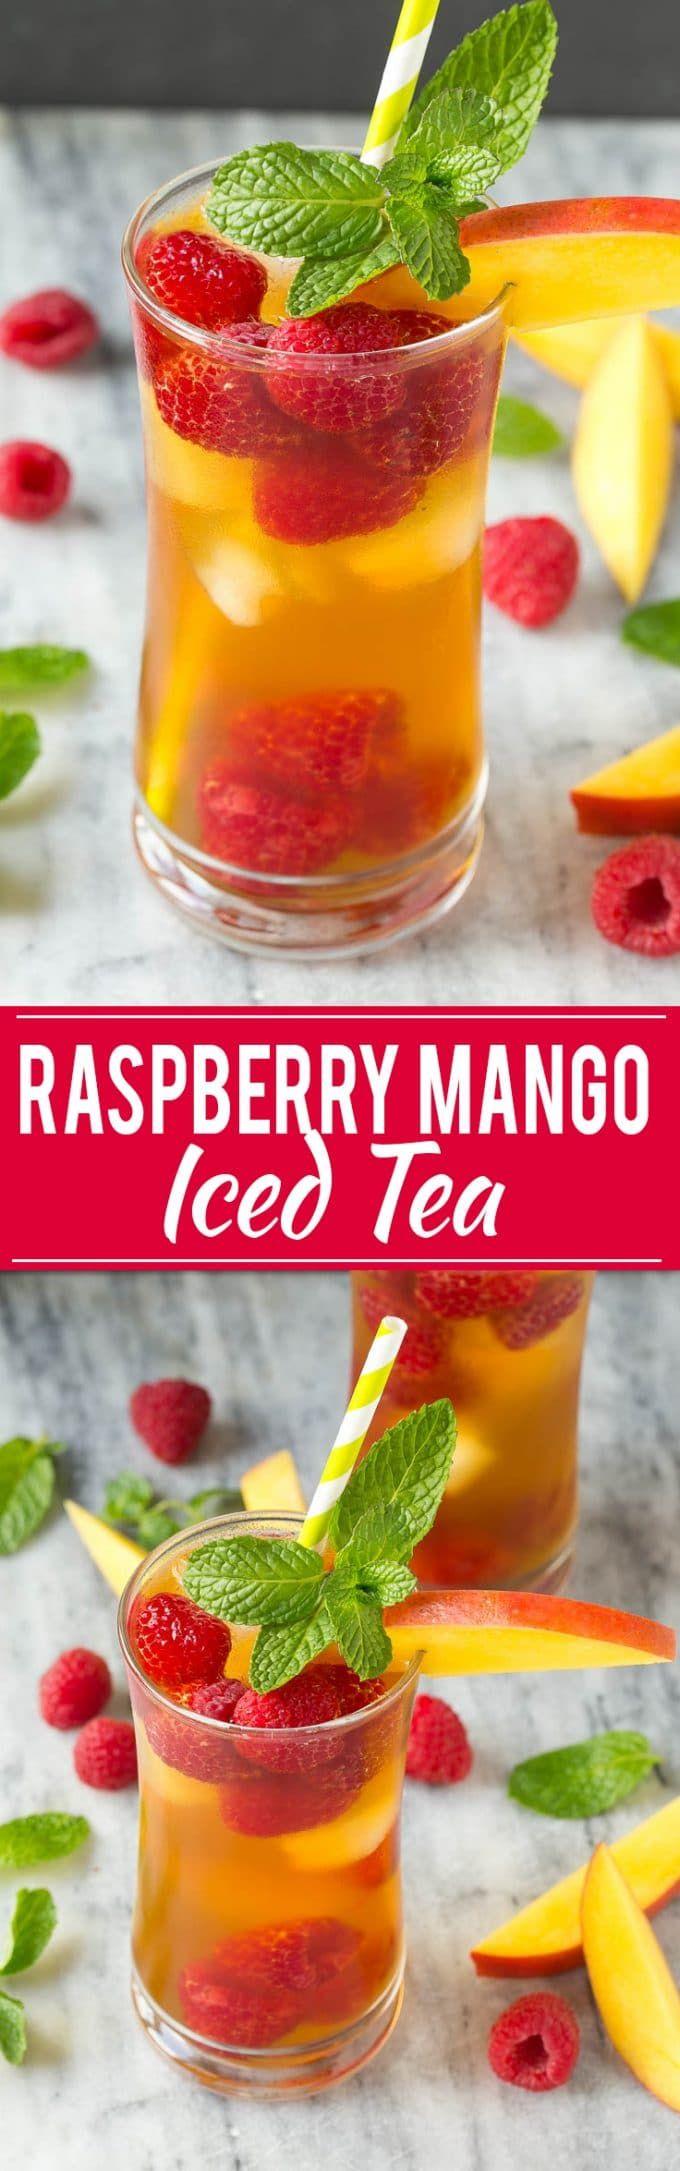 *To make with English Breakfast, black tea or Fuzzy Peaches, black tea*  A recipe for light and refreshing raspberry mango iced tea.